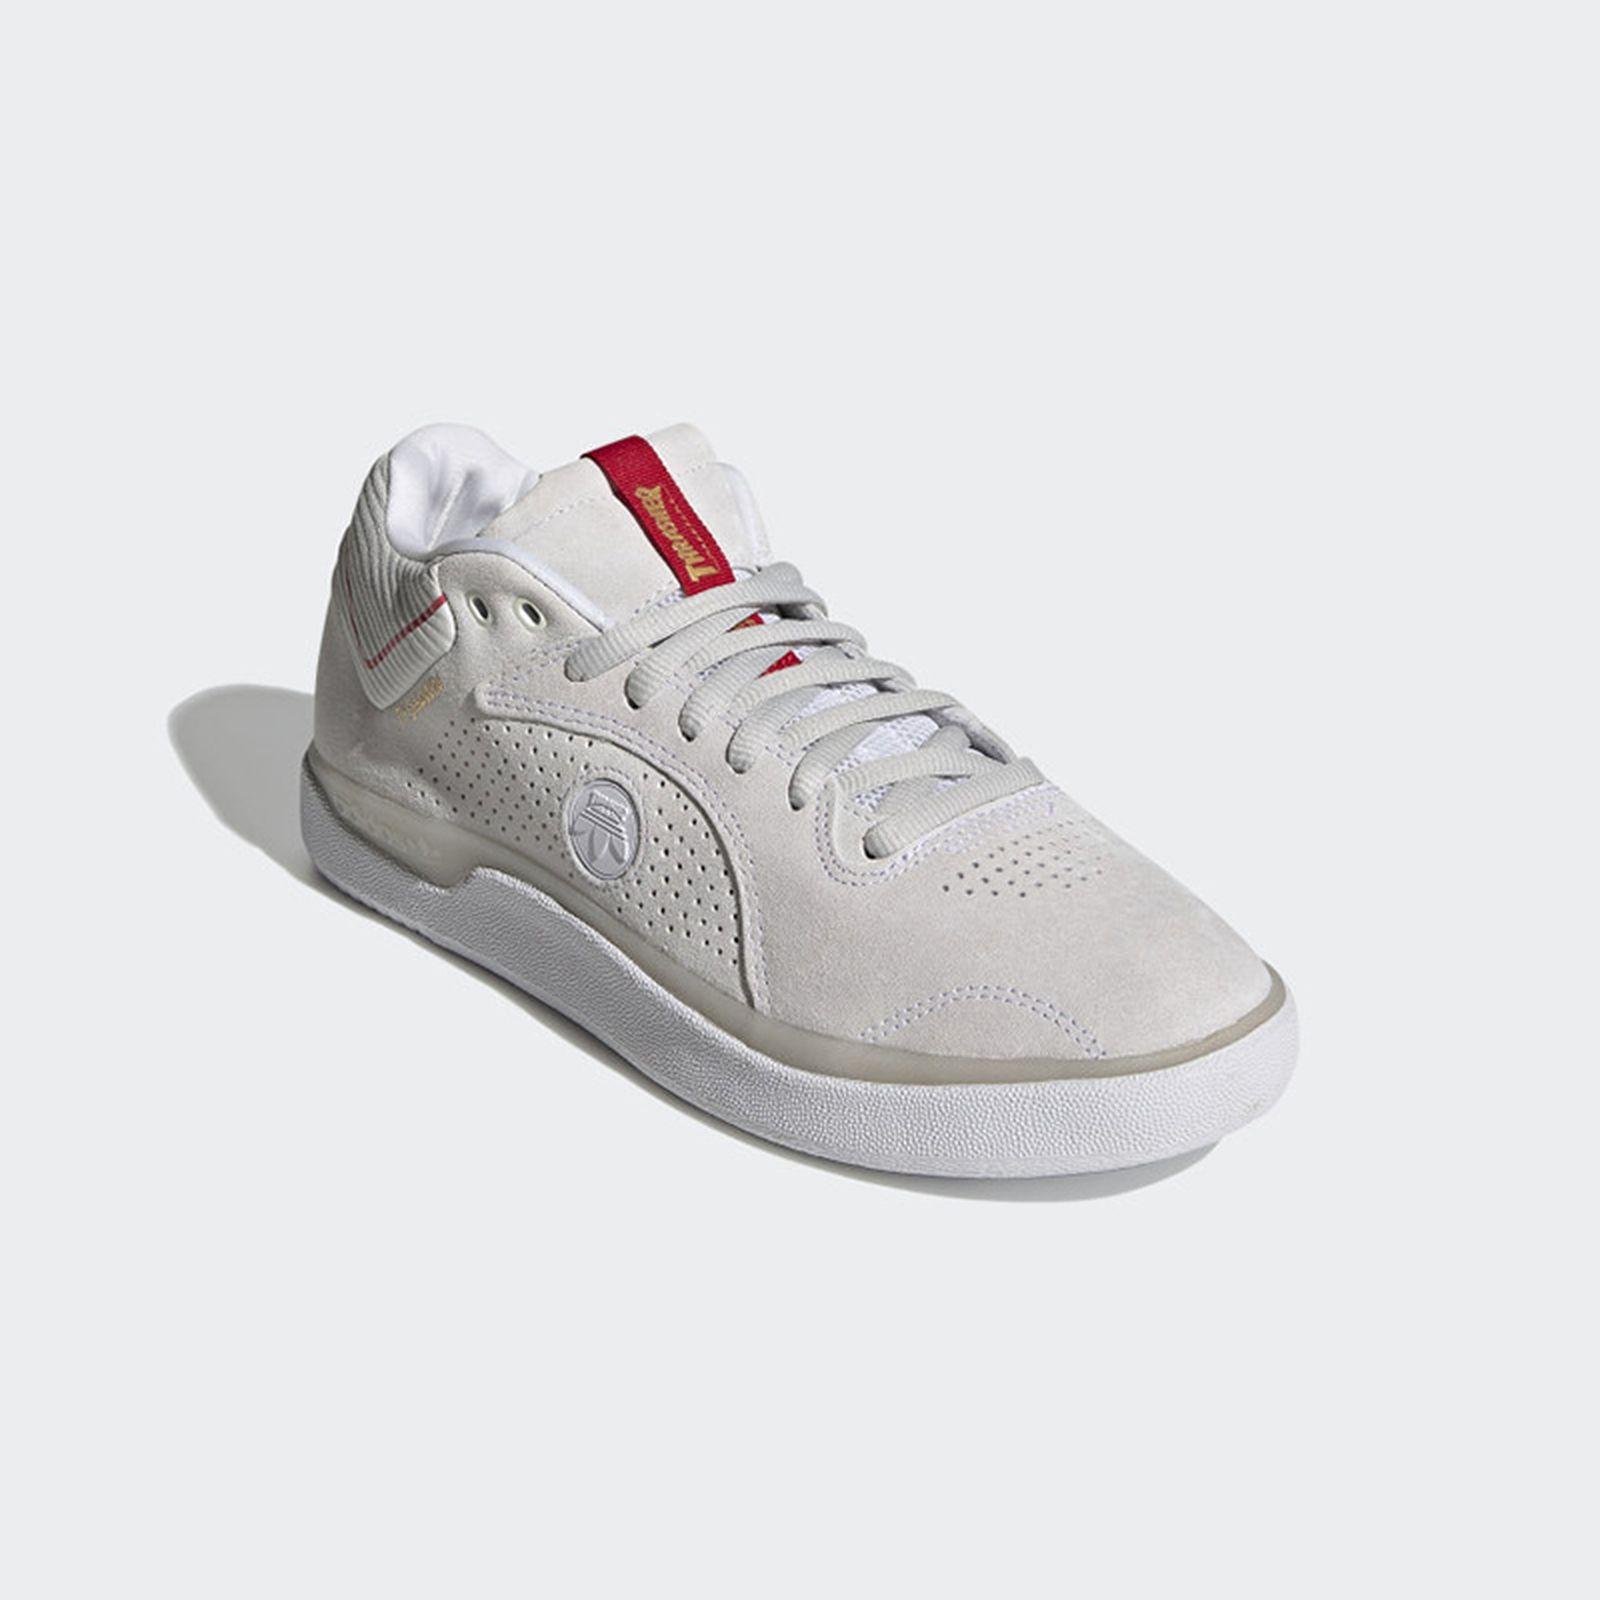 thrasher-adidas-superstar-adv-tyshawn-jones-release-date-price-1-10